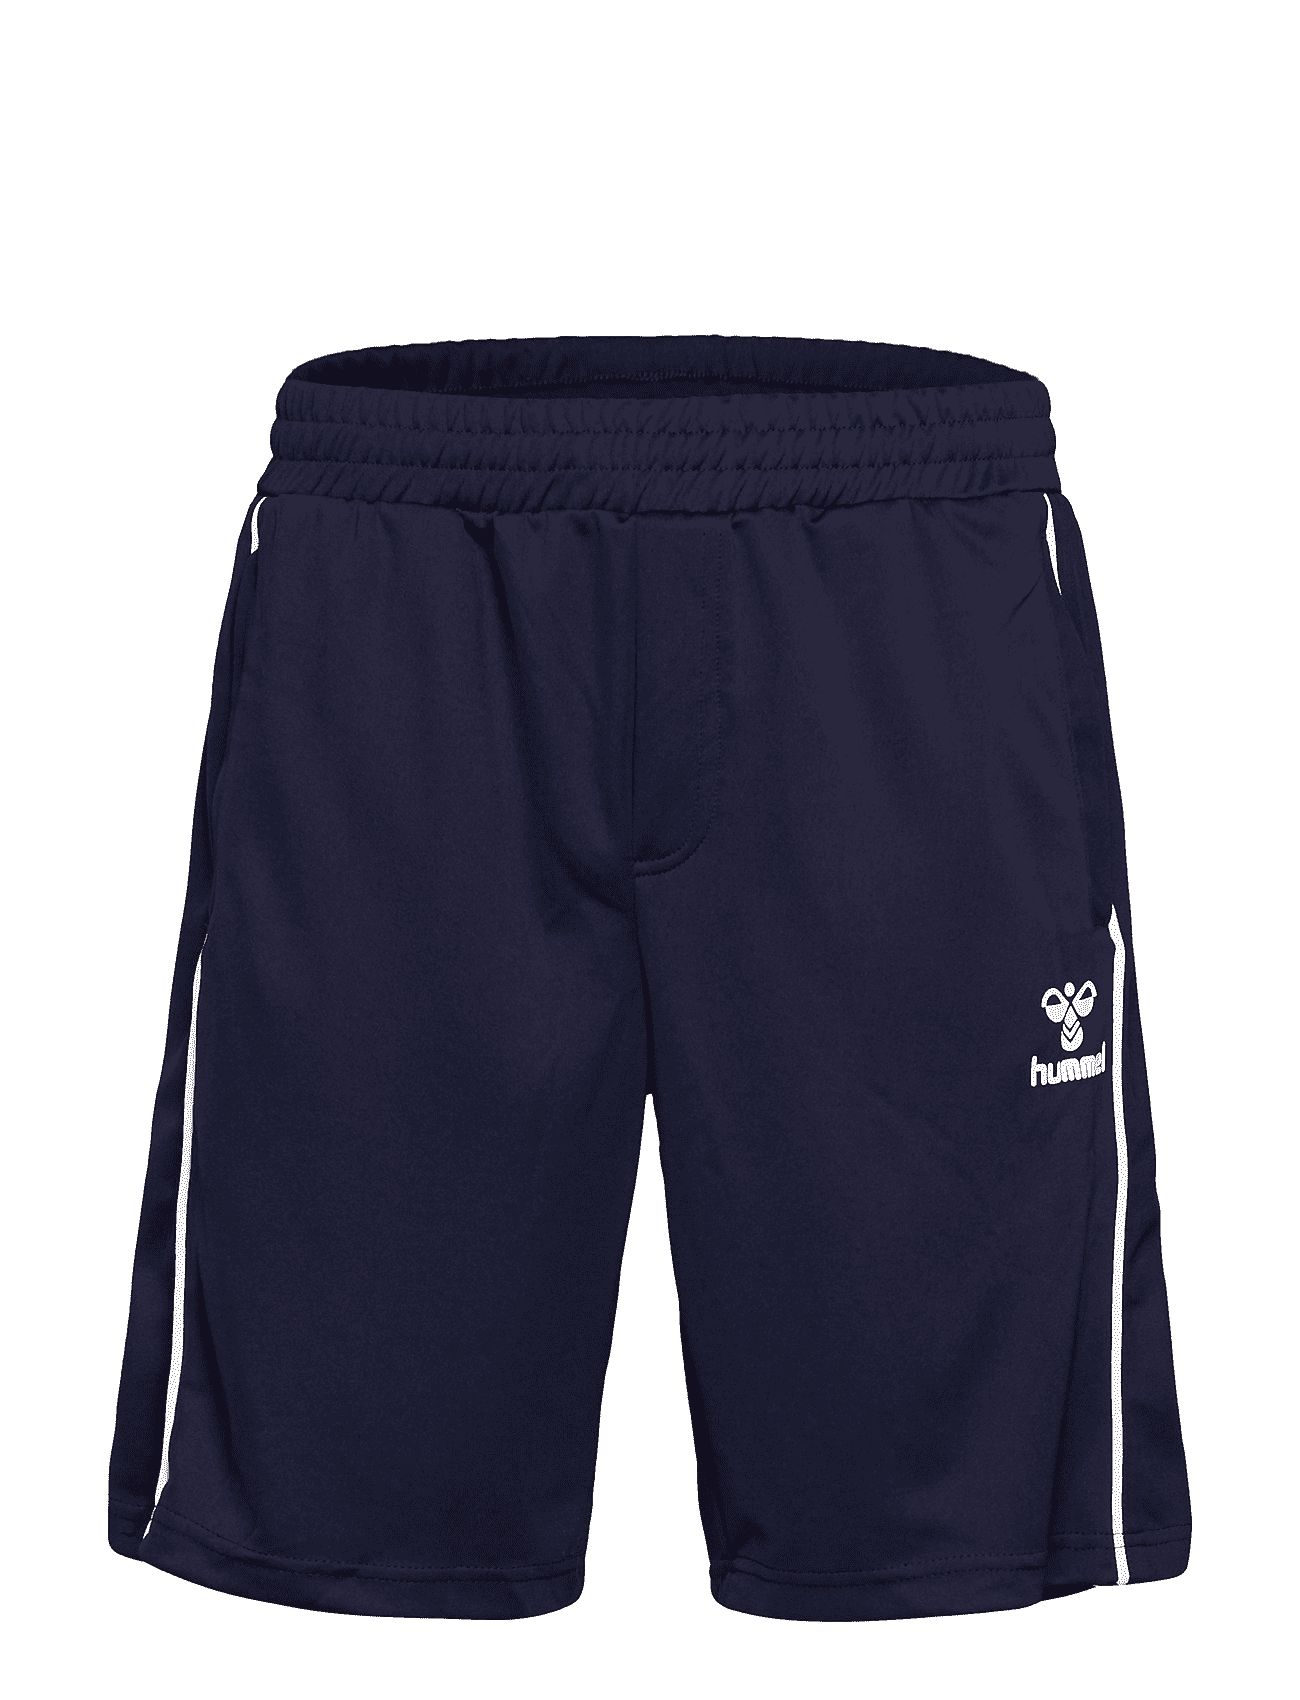 Hummel Arne shorts